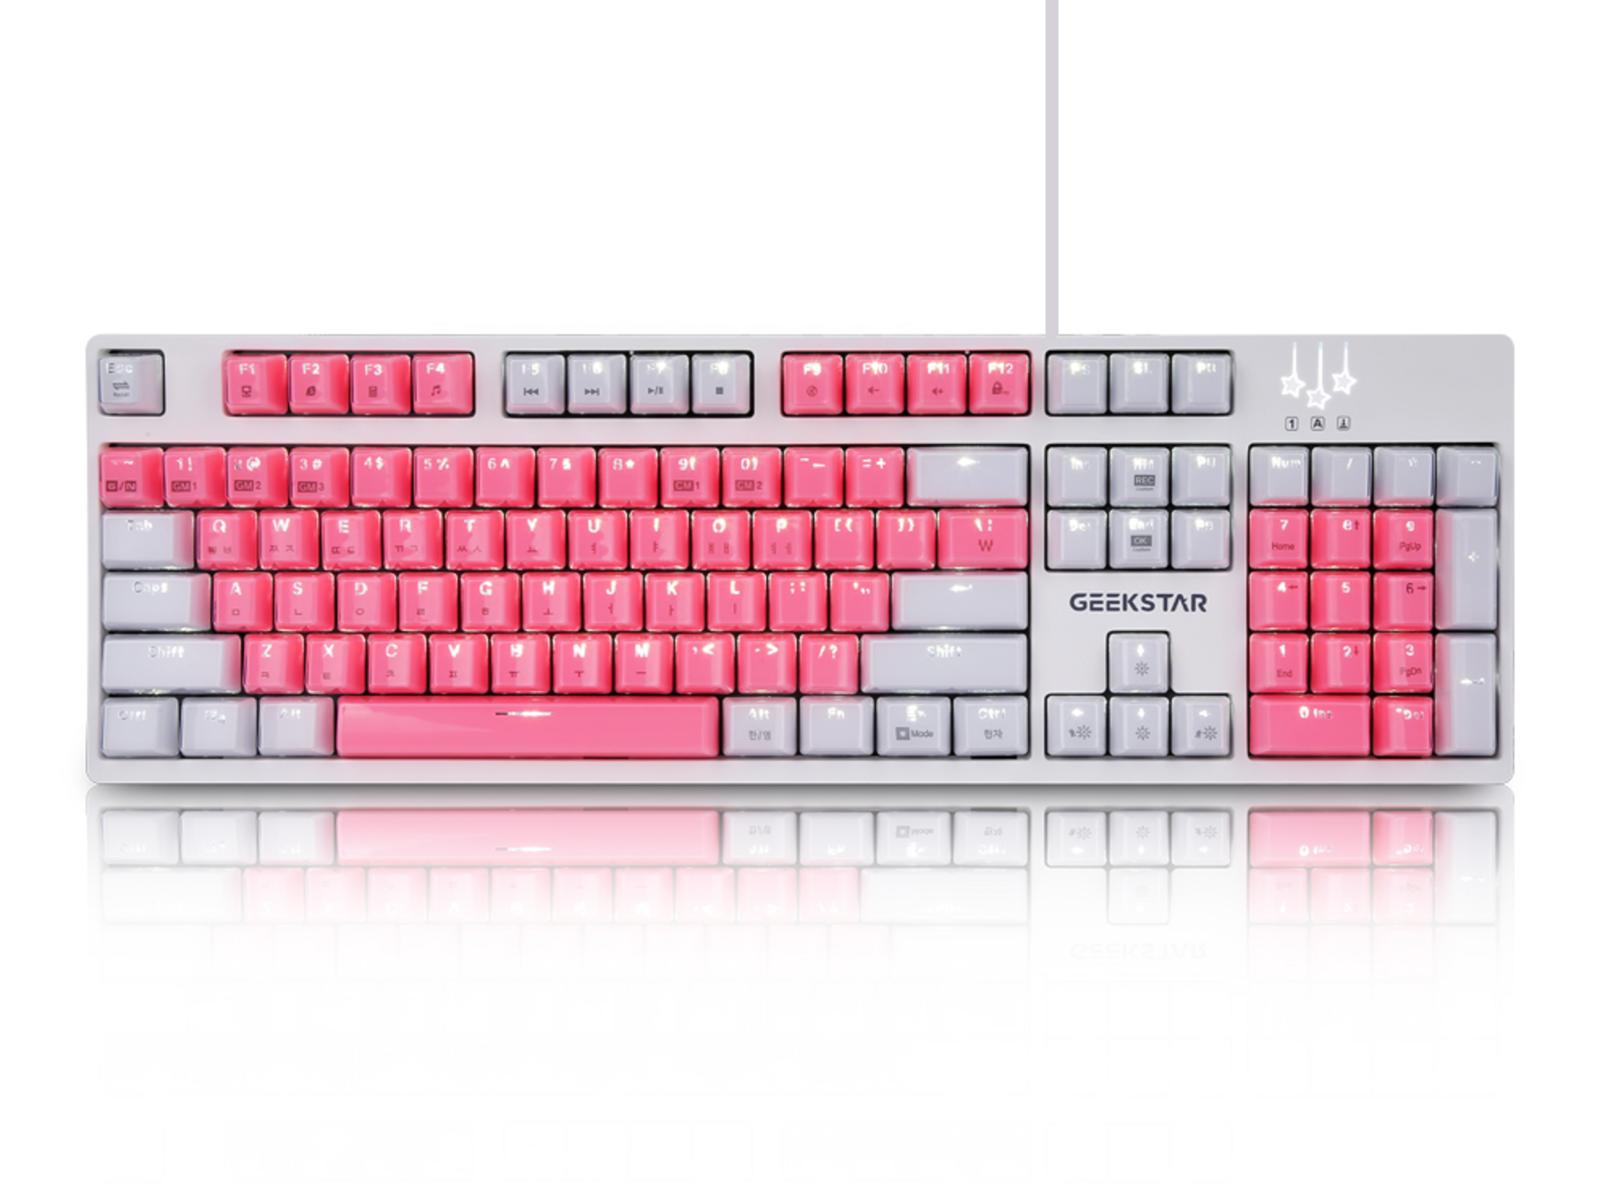 Geekstar gk801 keyboard 01